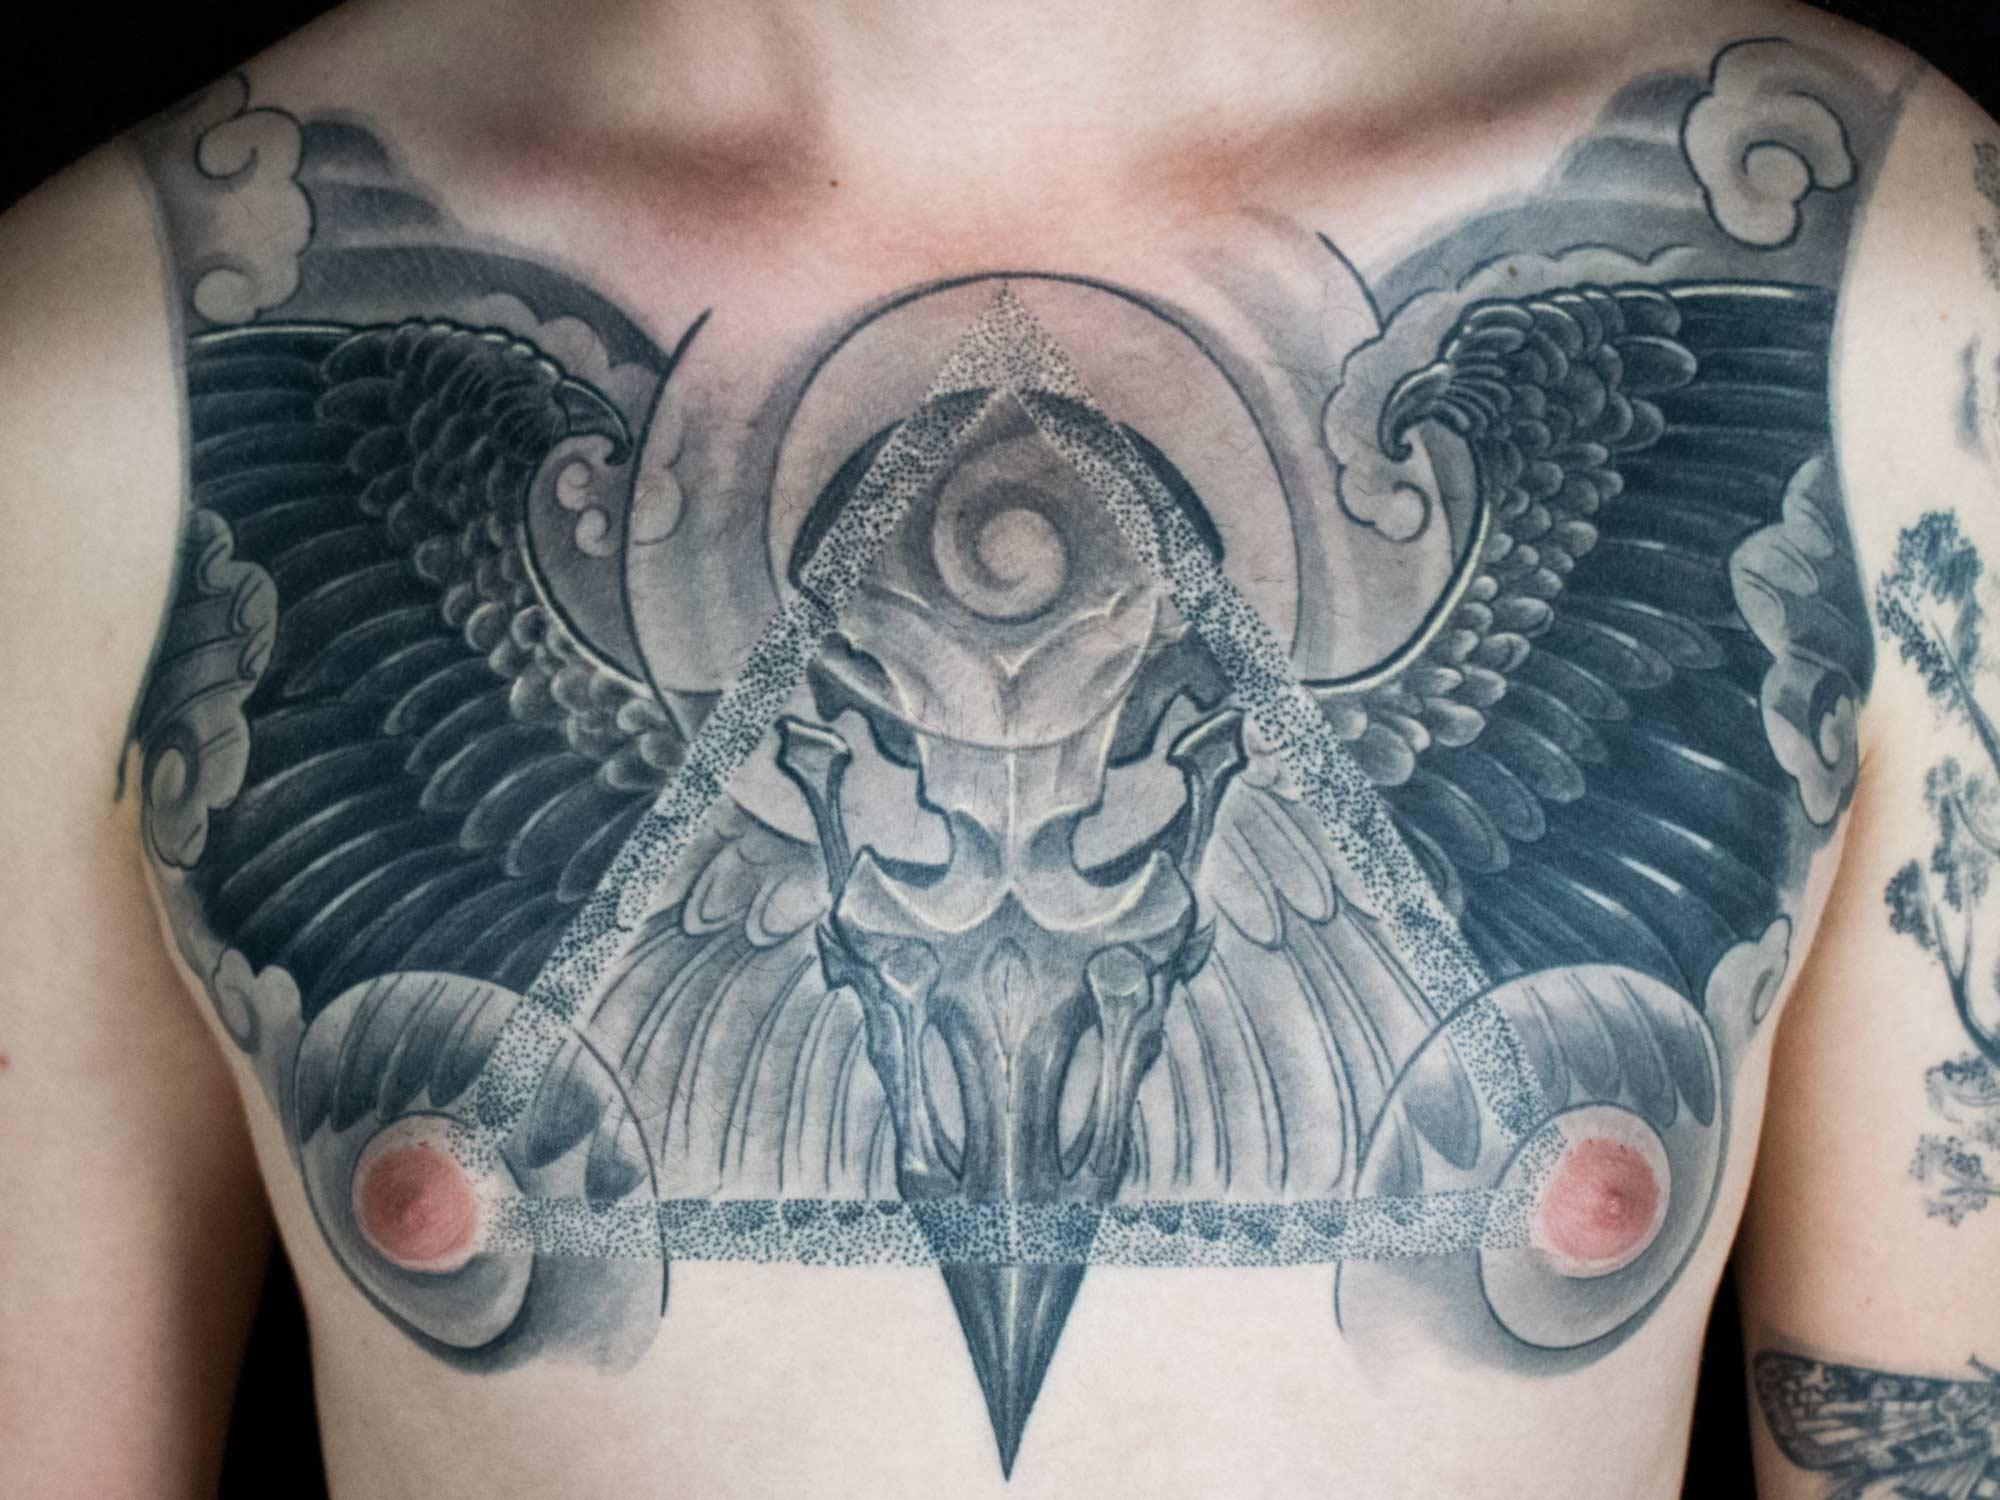 Rabe-japanisch-Dotwork-Schädel-Skull-Dreieck-Tattoo-Raul-Shit-for-Life-Hits-for-Life-Taufkirchen-München